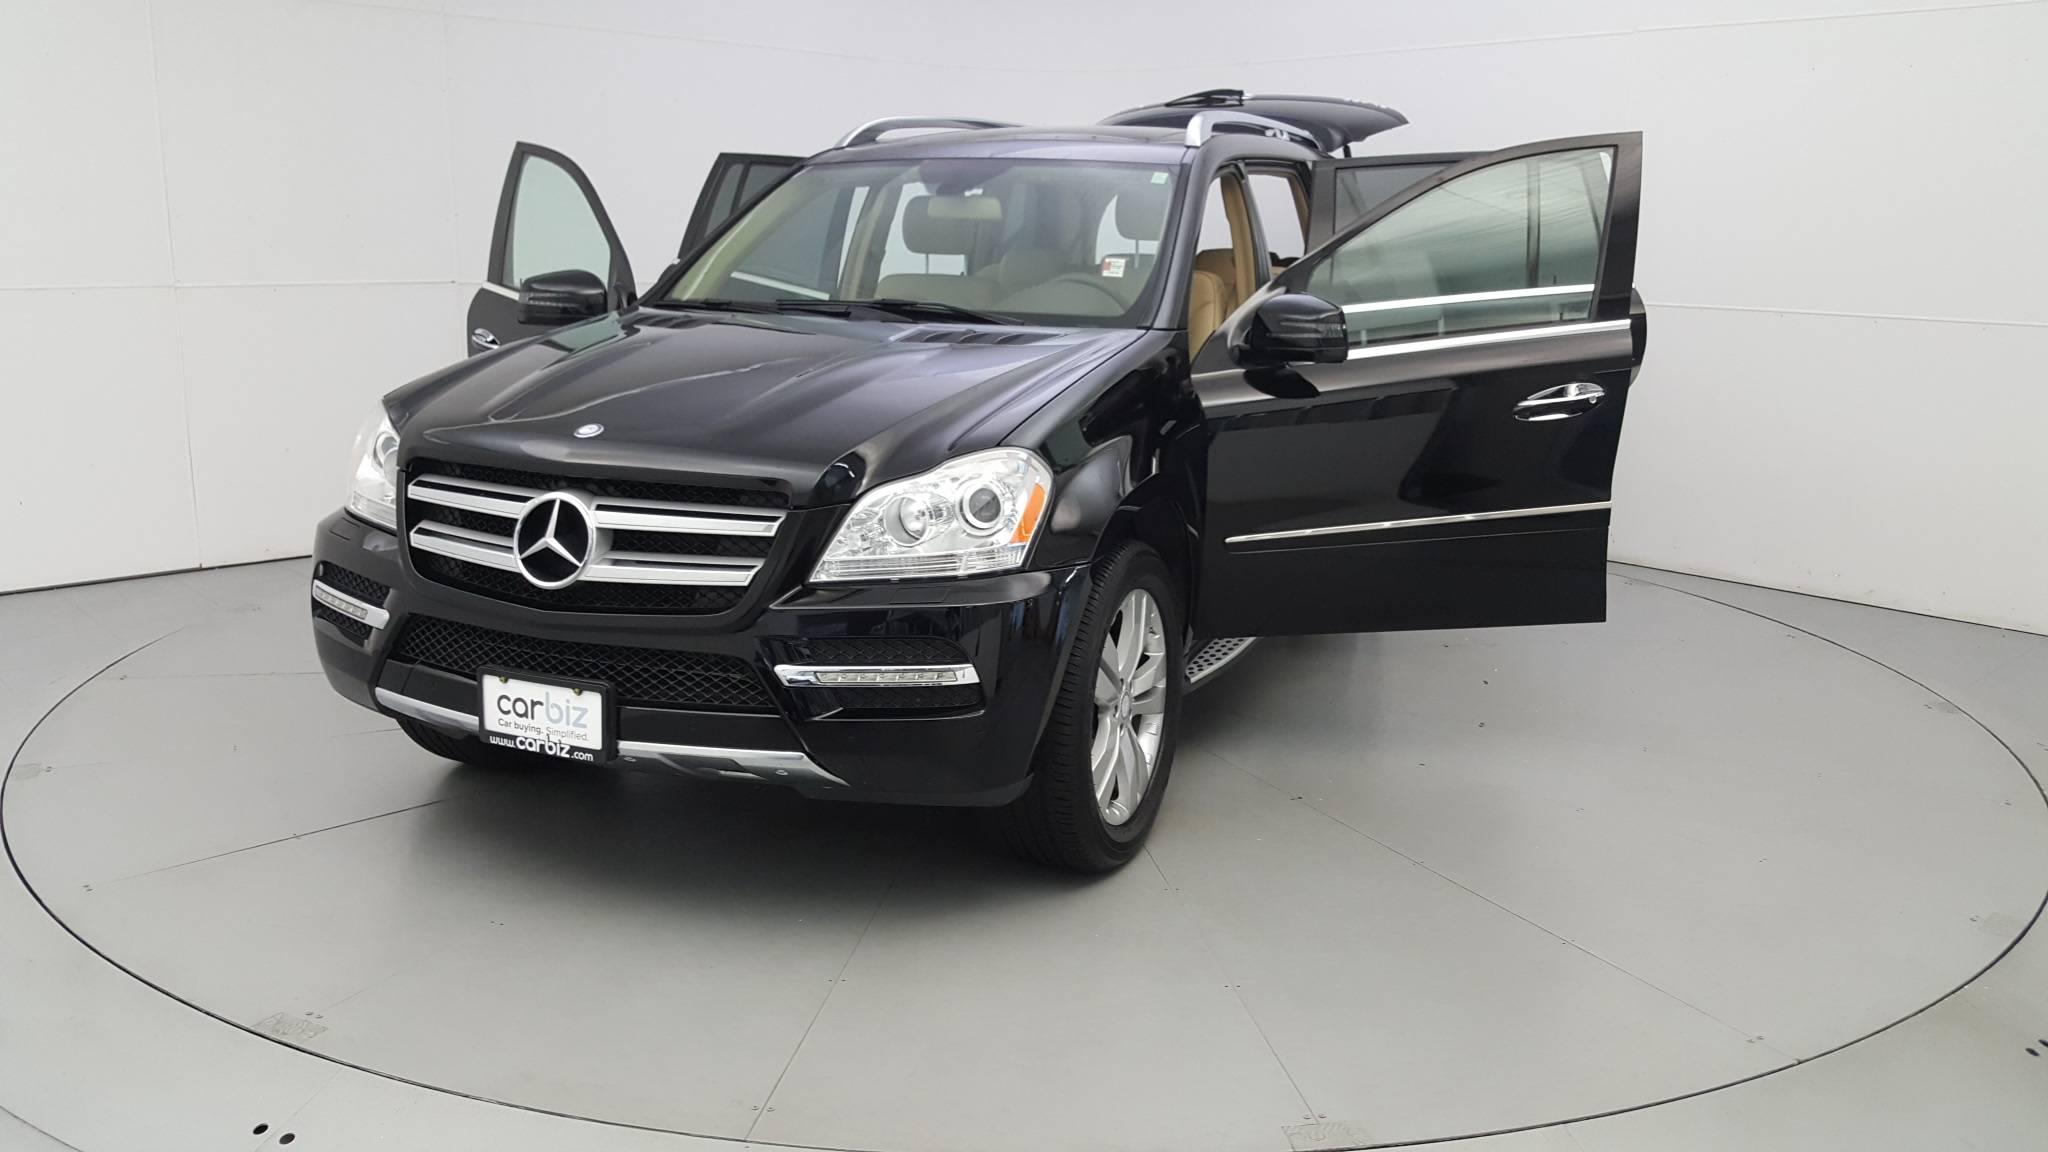 Pre-Owned 2012 Mercedes-Benz GL 450 GL 450